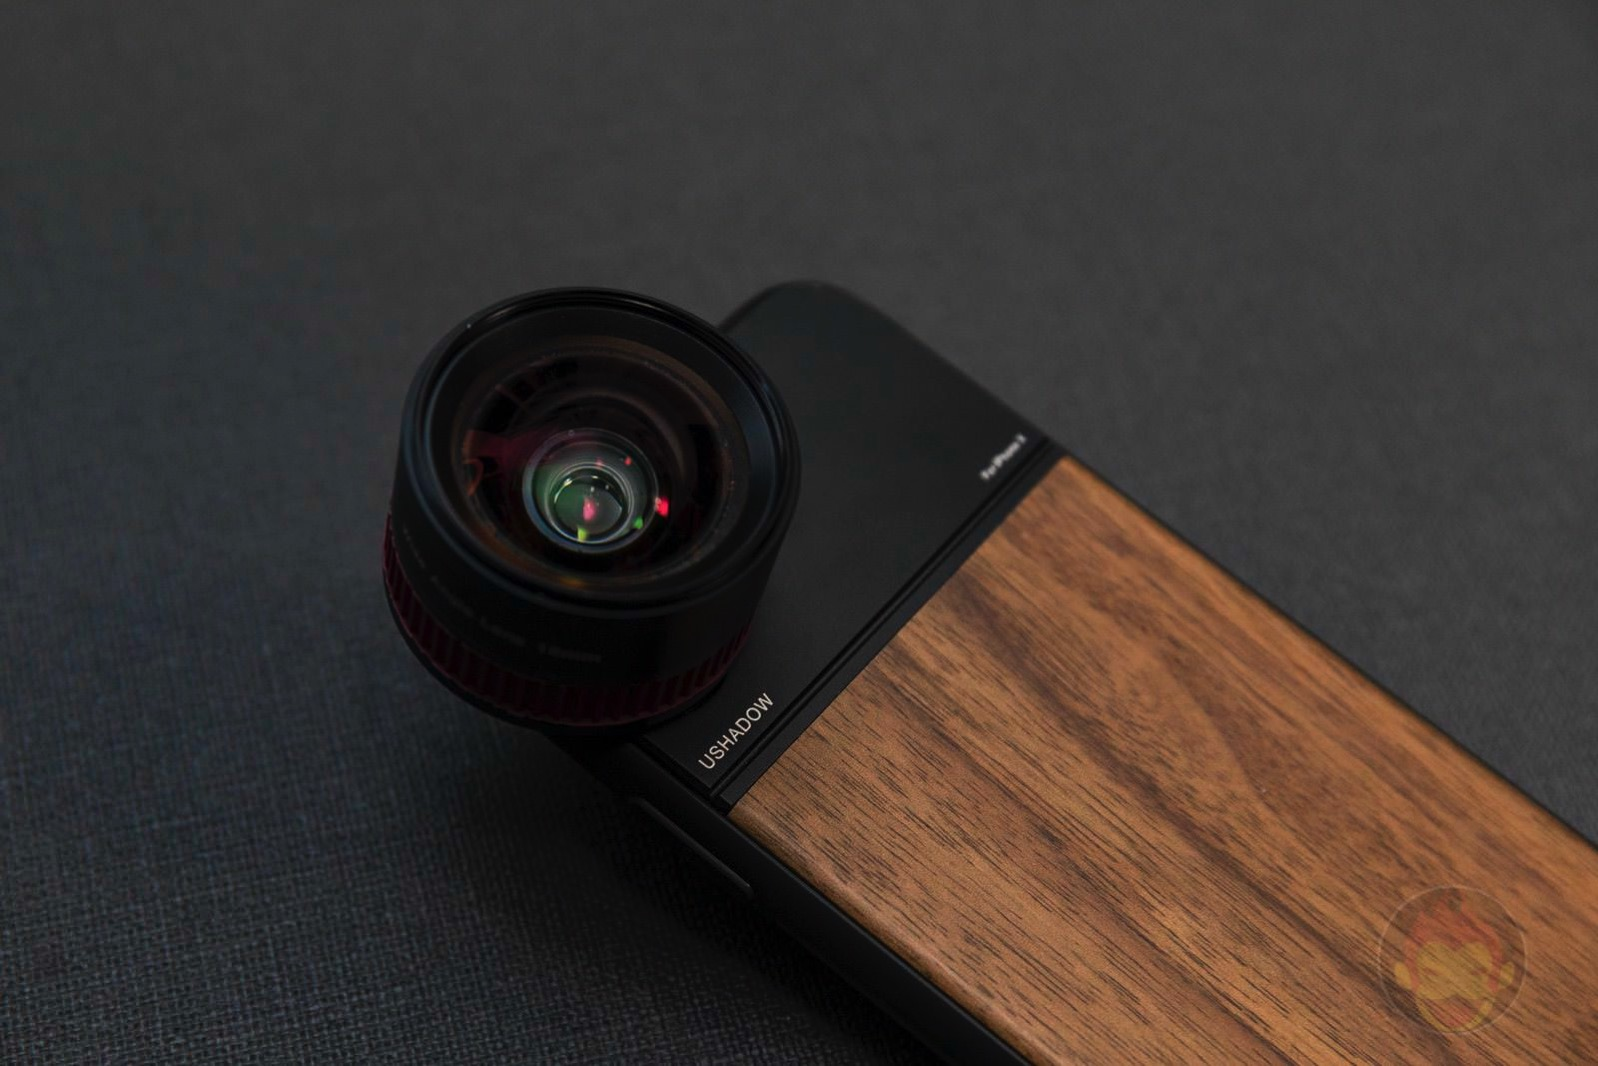 USHADOW-X1-Lens-System-Review-08.jpg